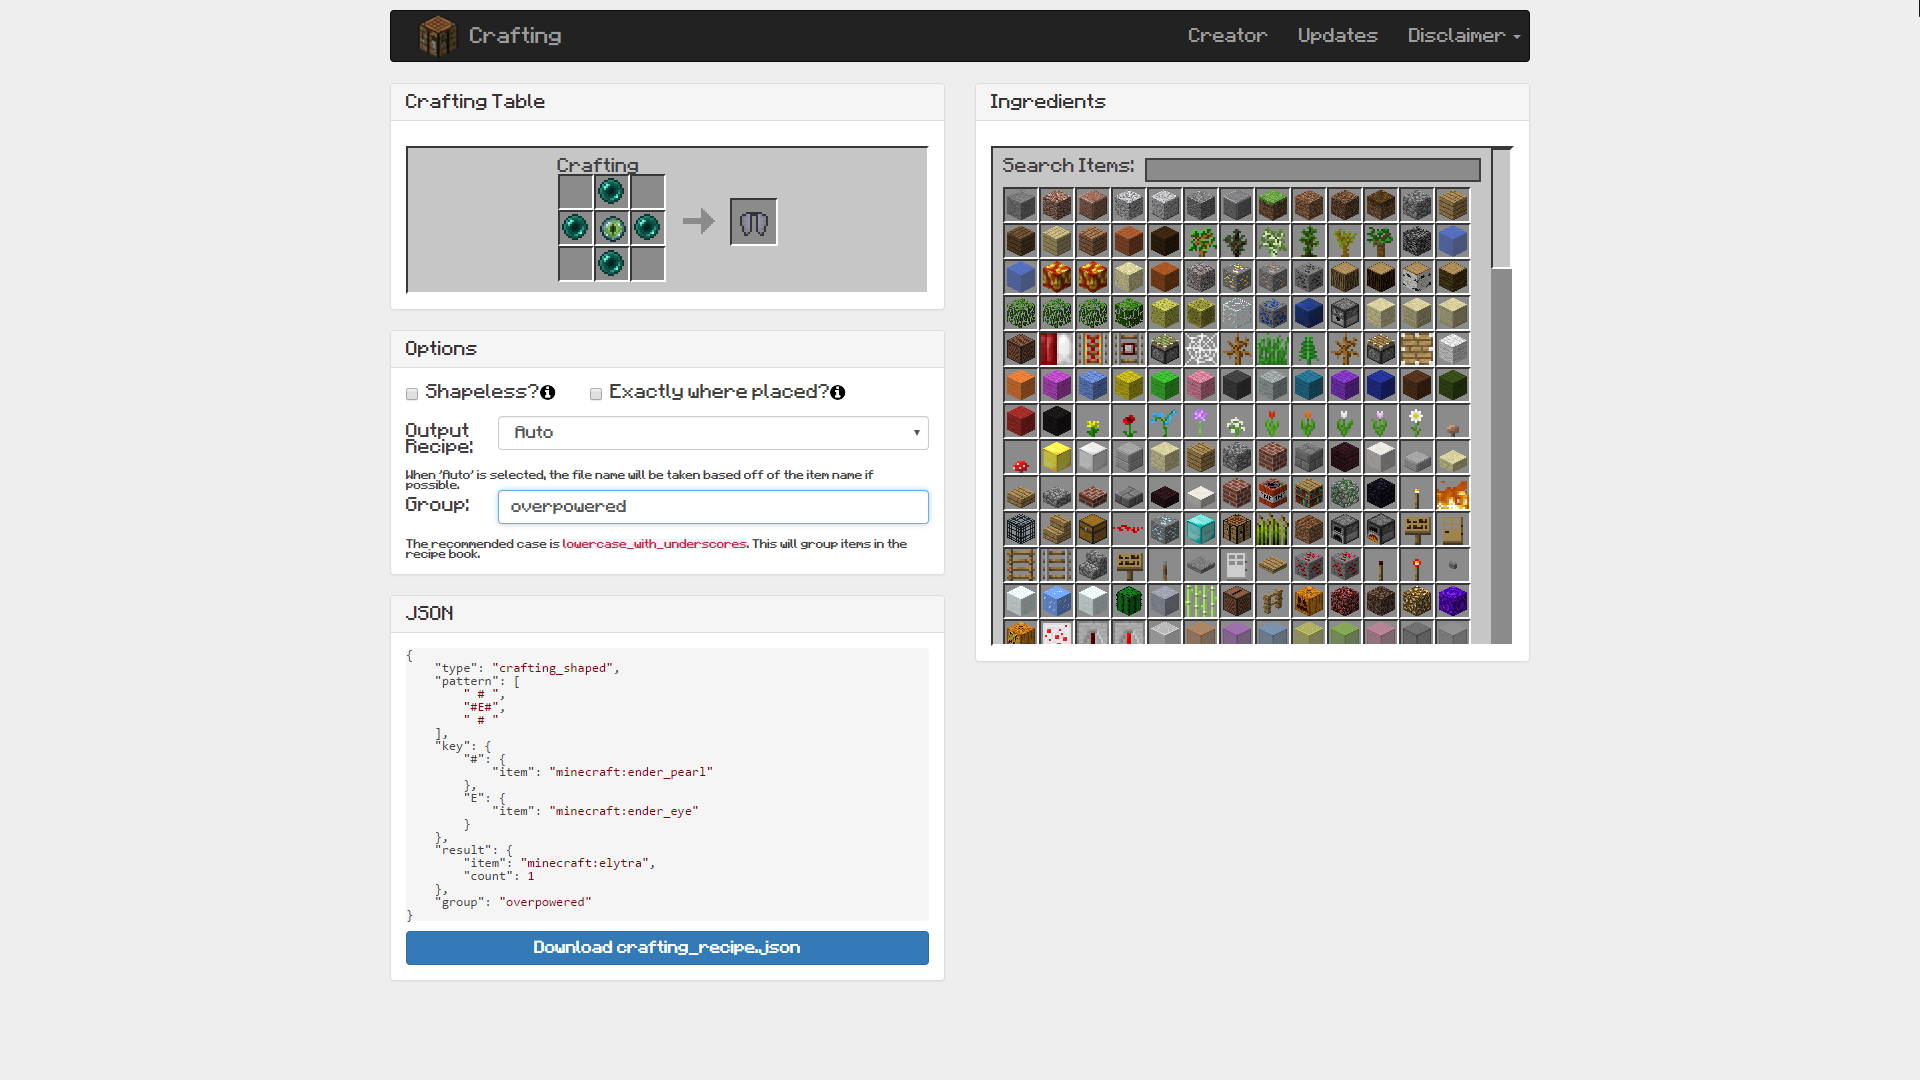 GitHub - destruc7i0n/crafting: Website for generating the